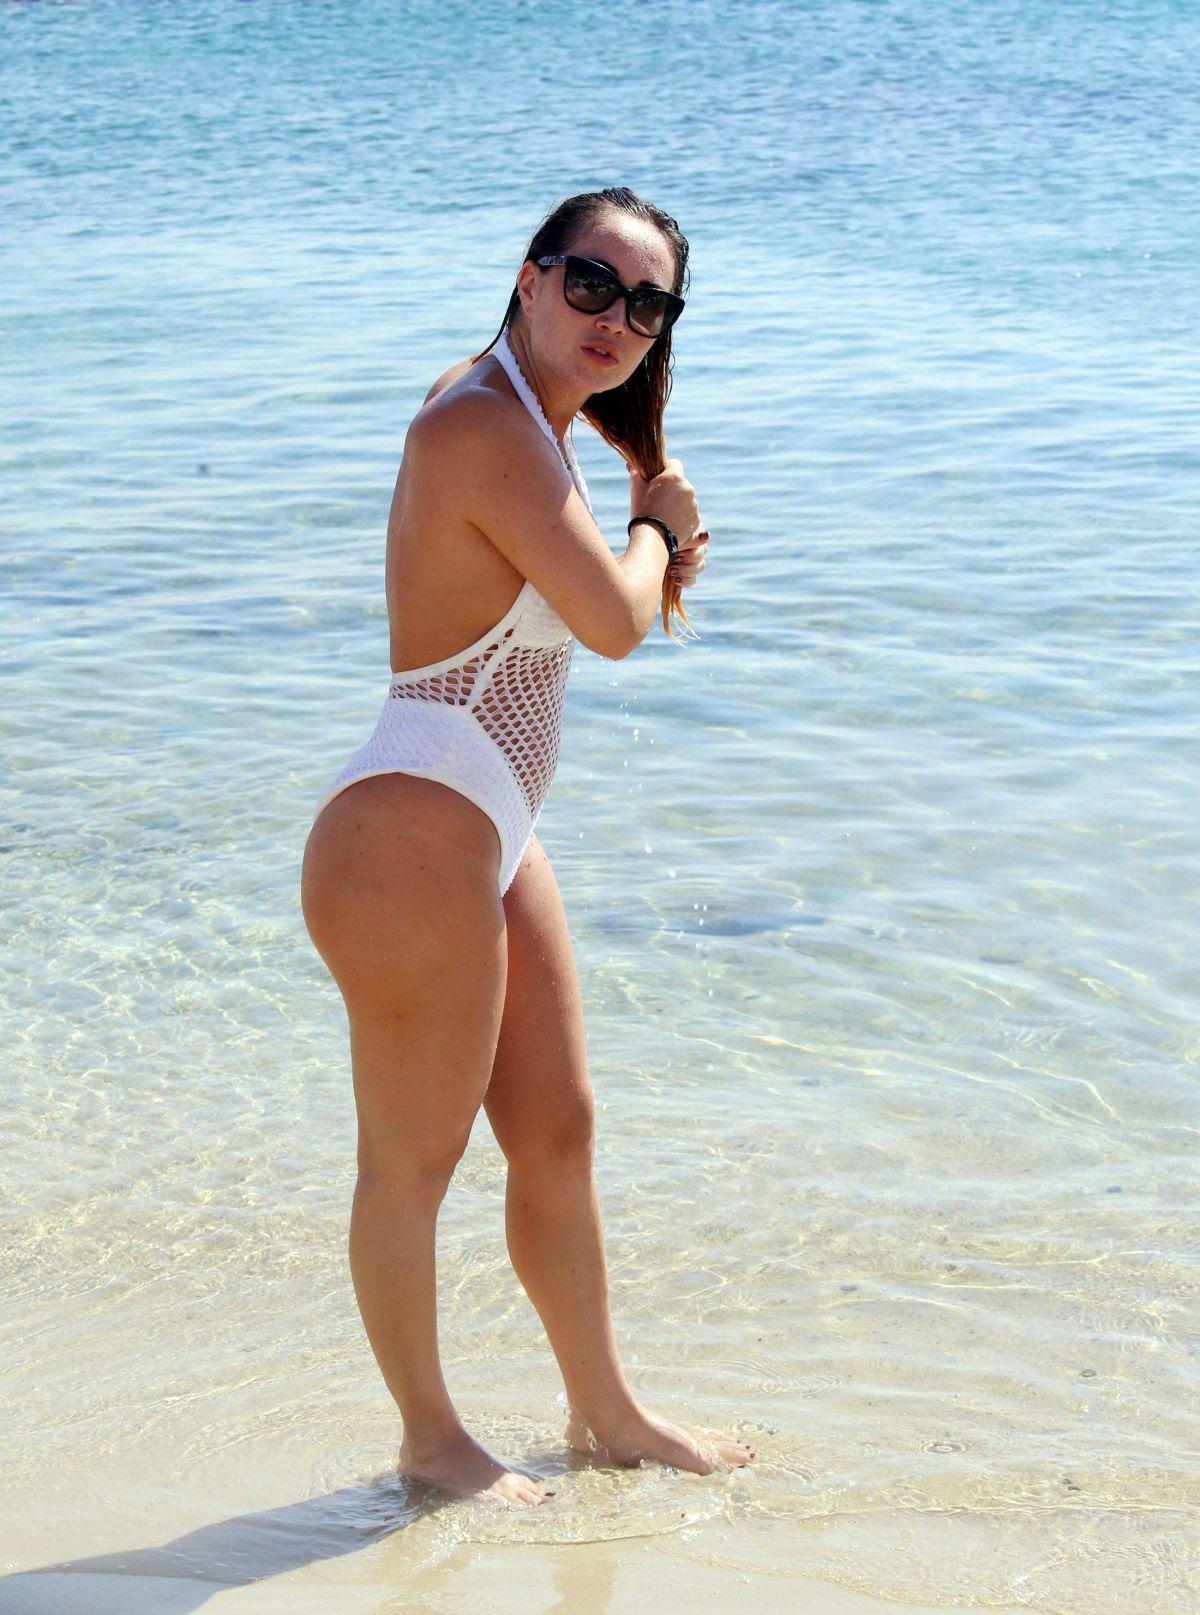 Bikini Lauryn Goodman naked (33 foto and video), Sexy, Cleavage, Twitter, braless 2017